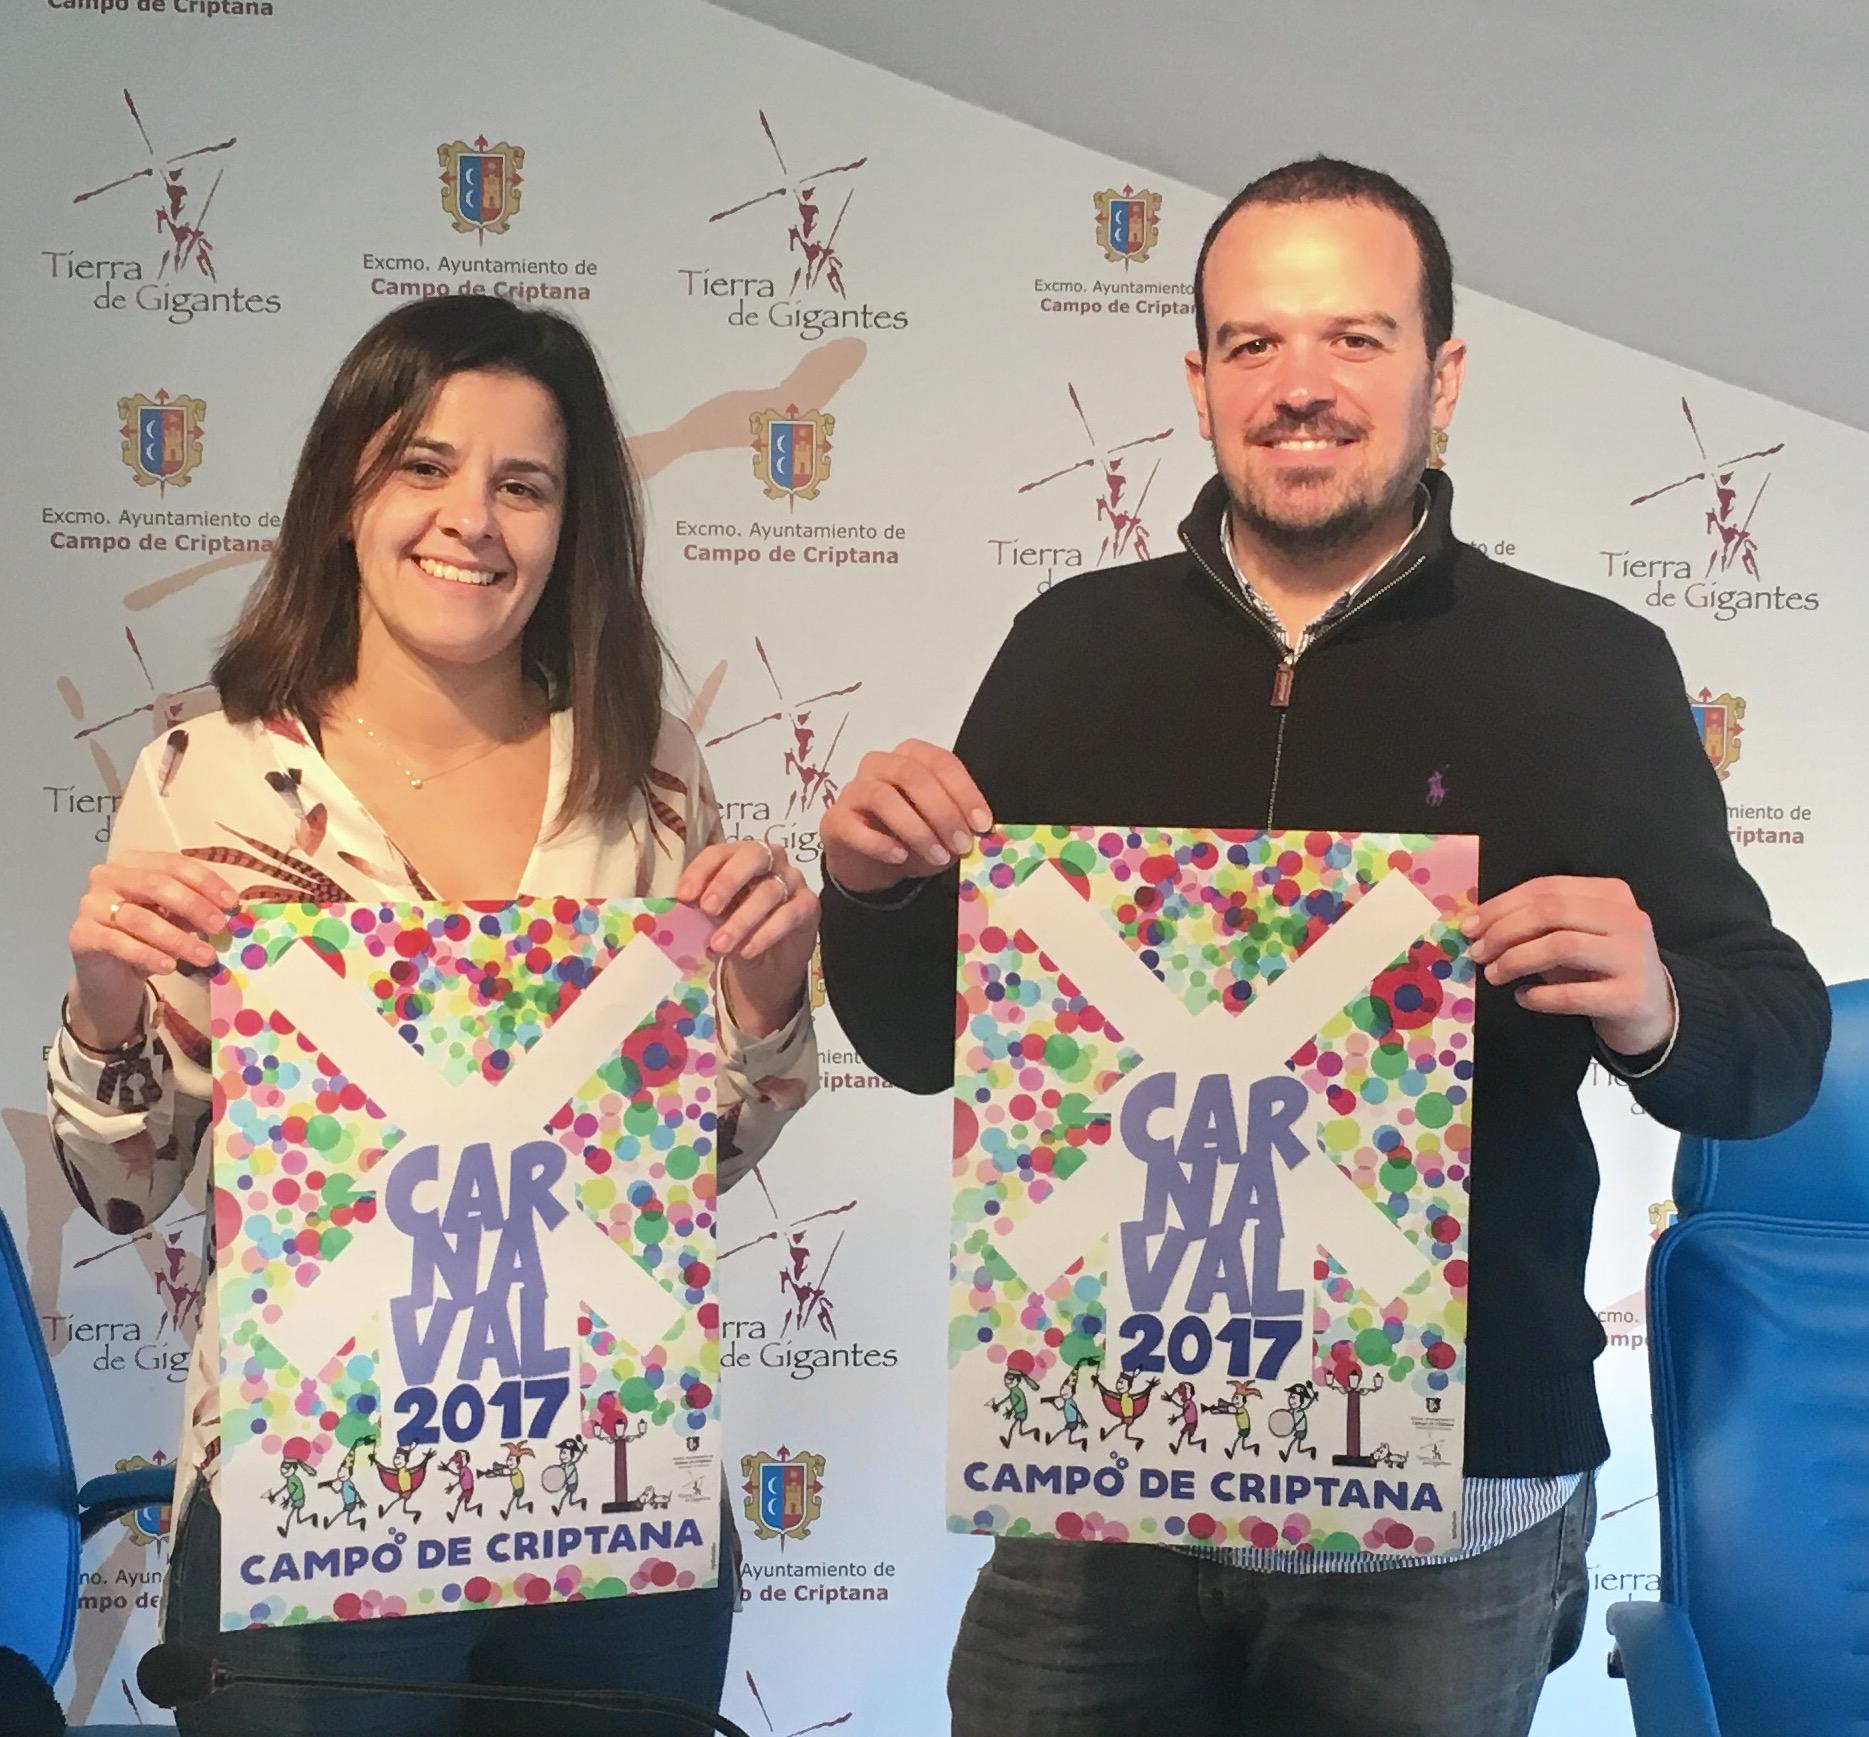 Ana Medina presenta la programación del Carnaval 2017 de Campo de Criptana